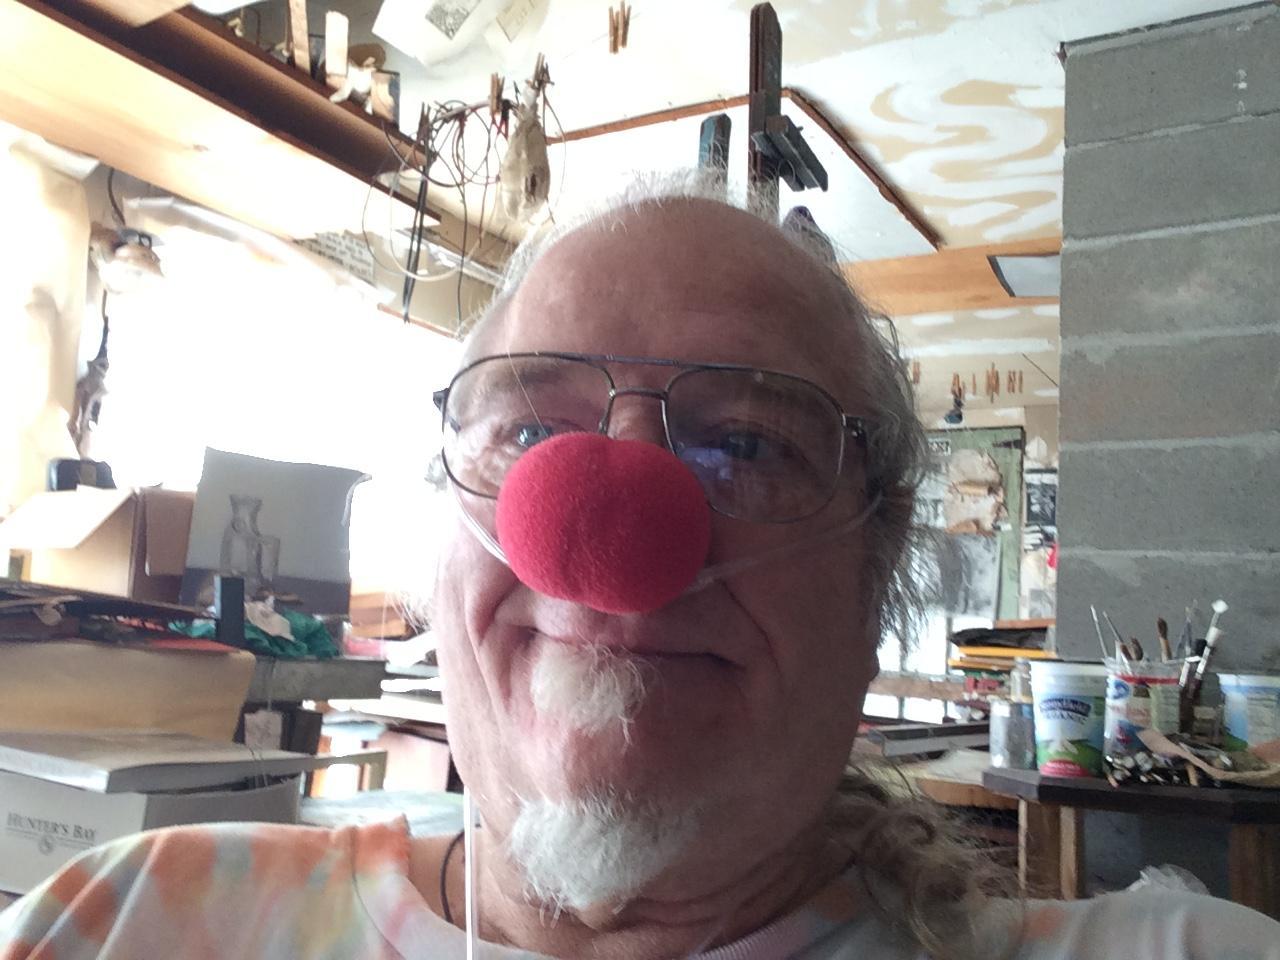 [Clown Rick]